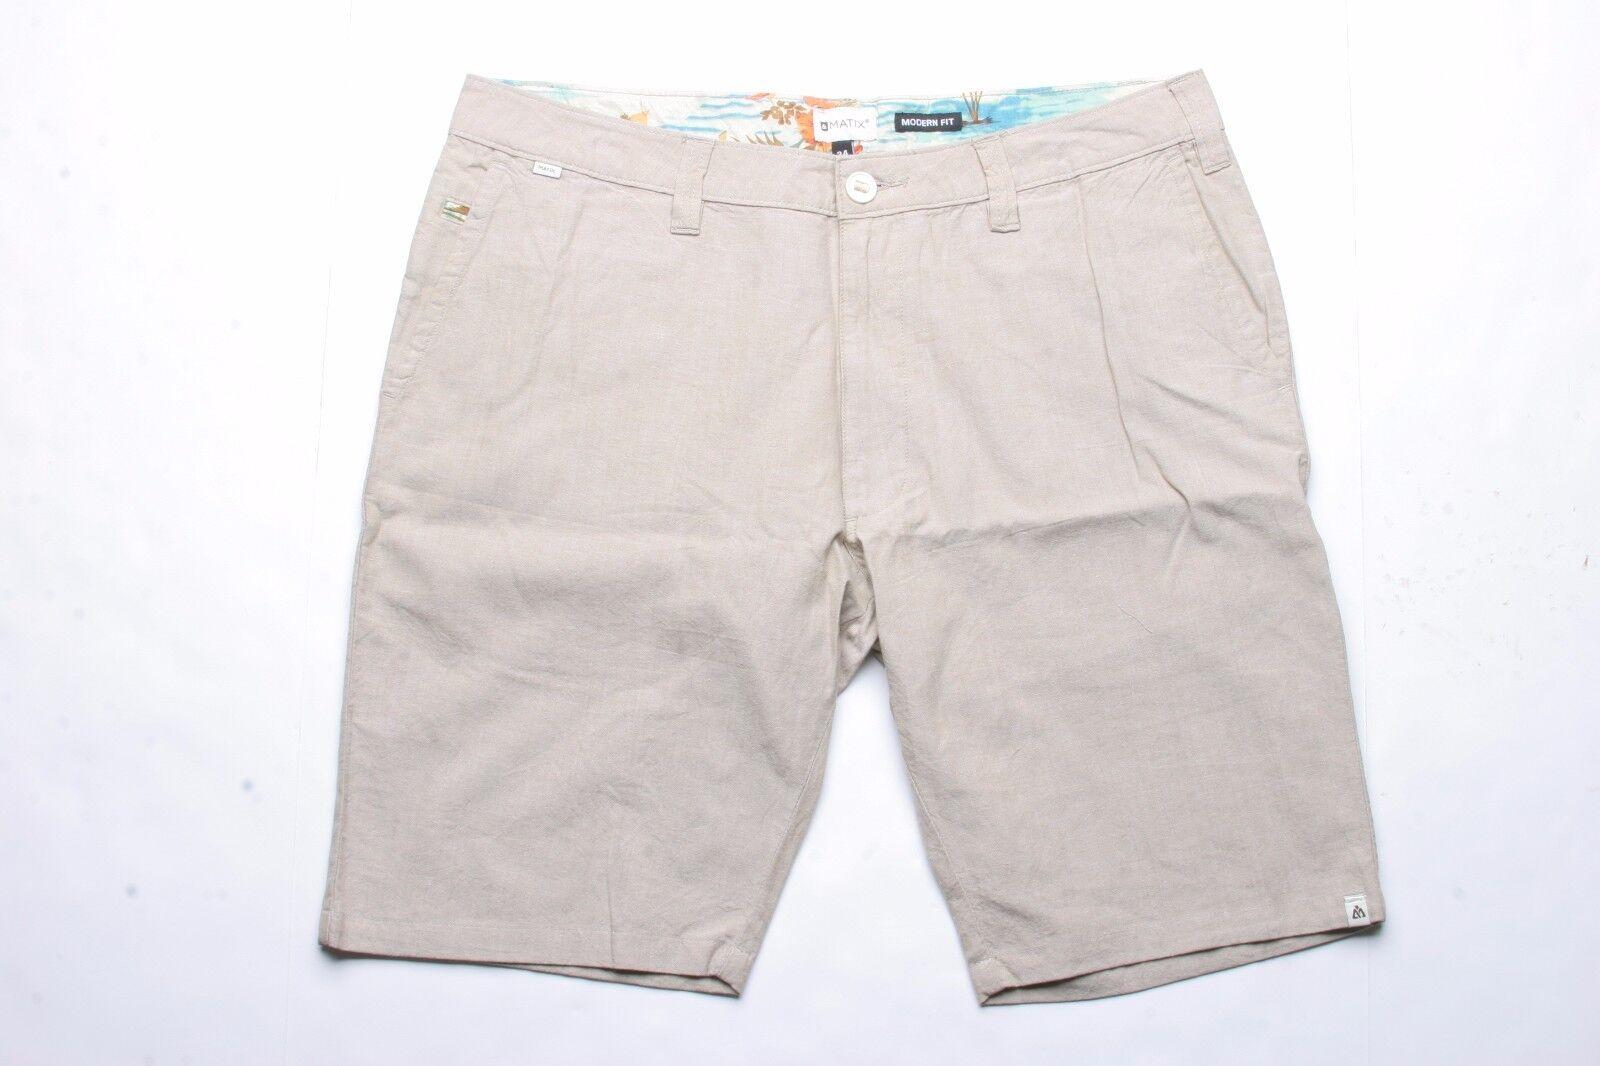 e2aea1bf67 MATIX Sands Short (34) Khaki nrypds3011-Shorts - coats ...